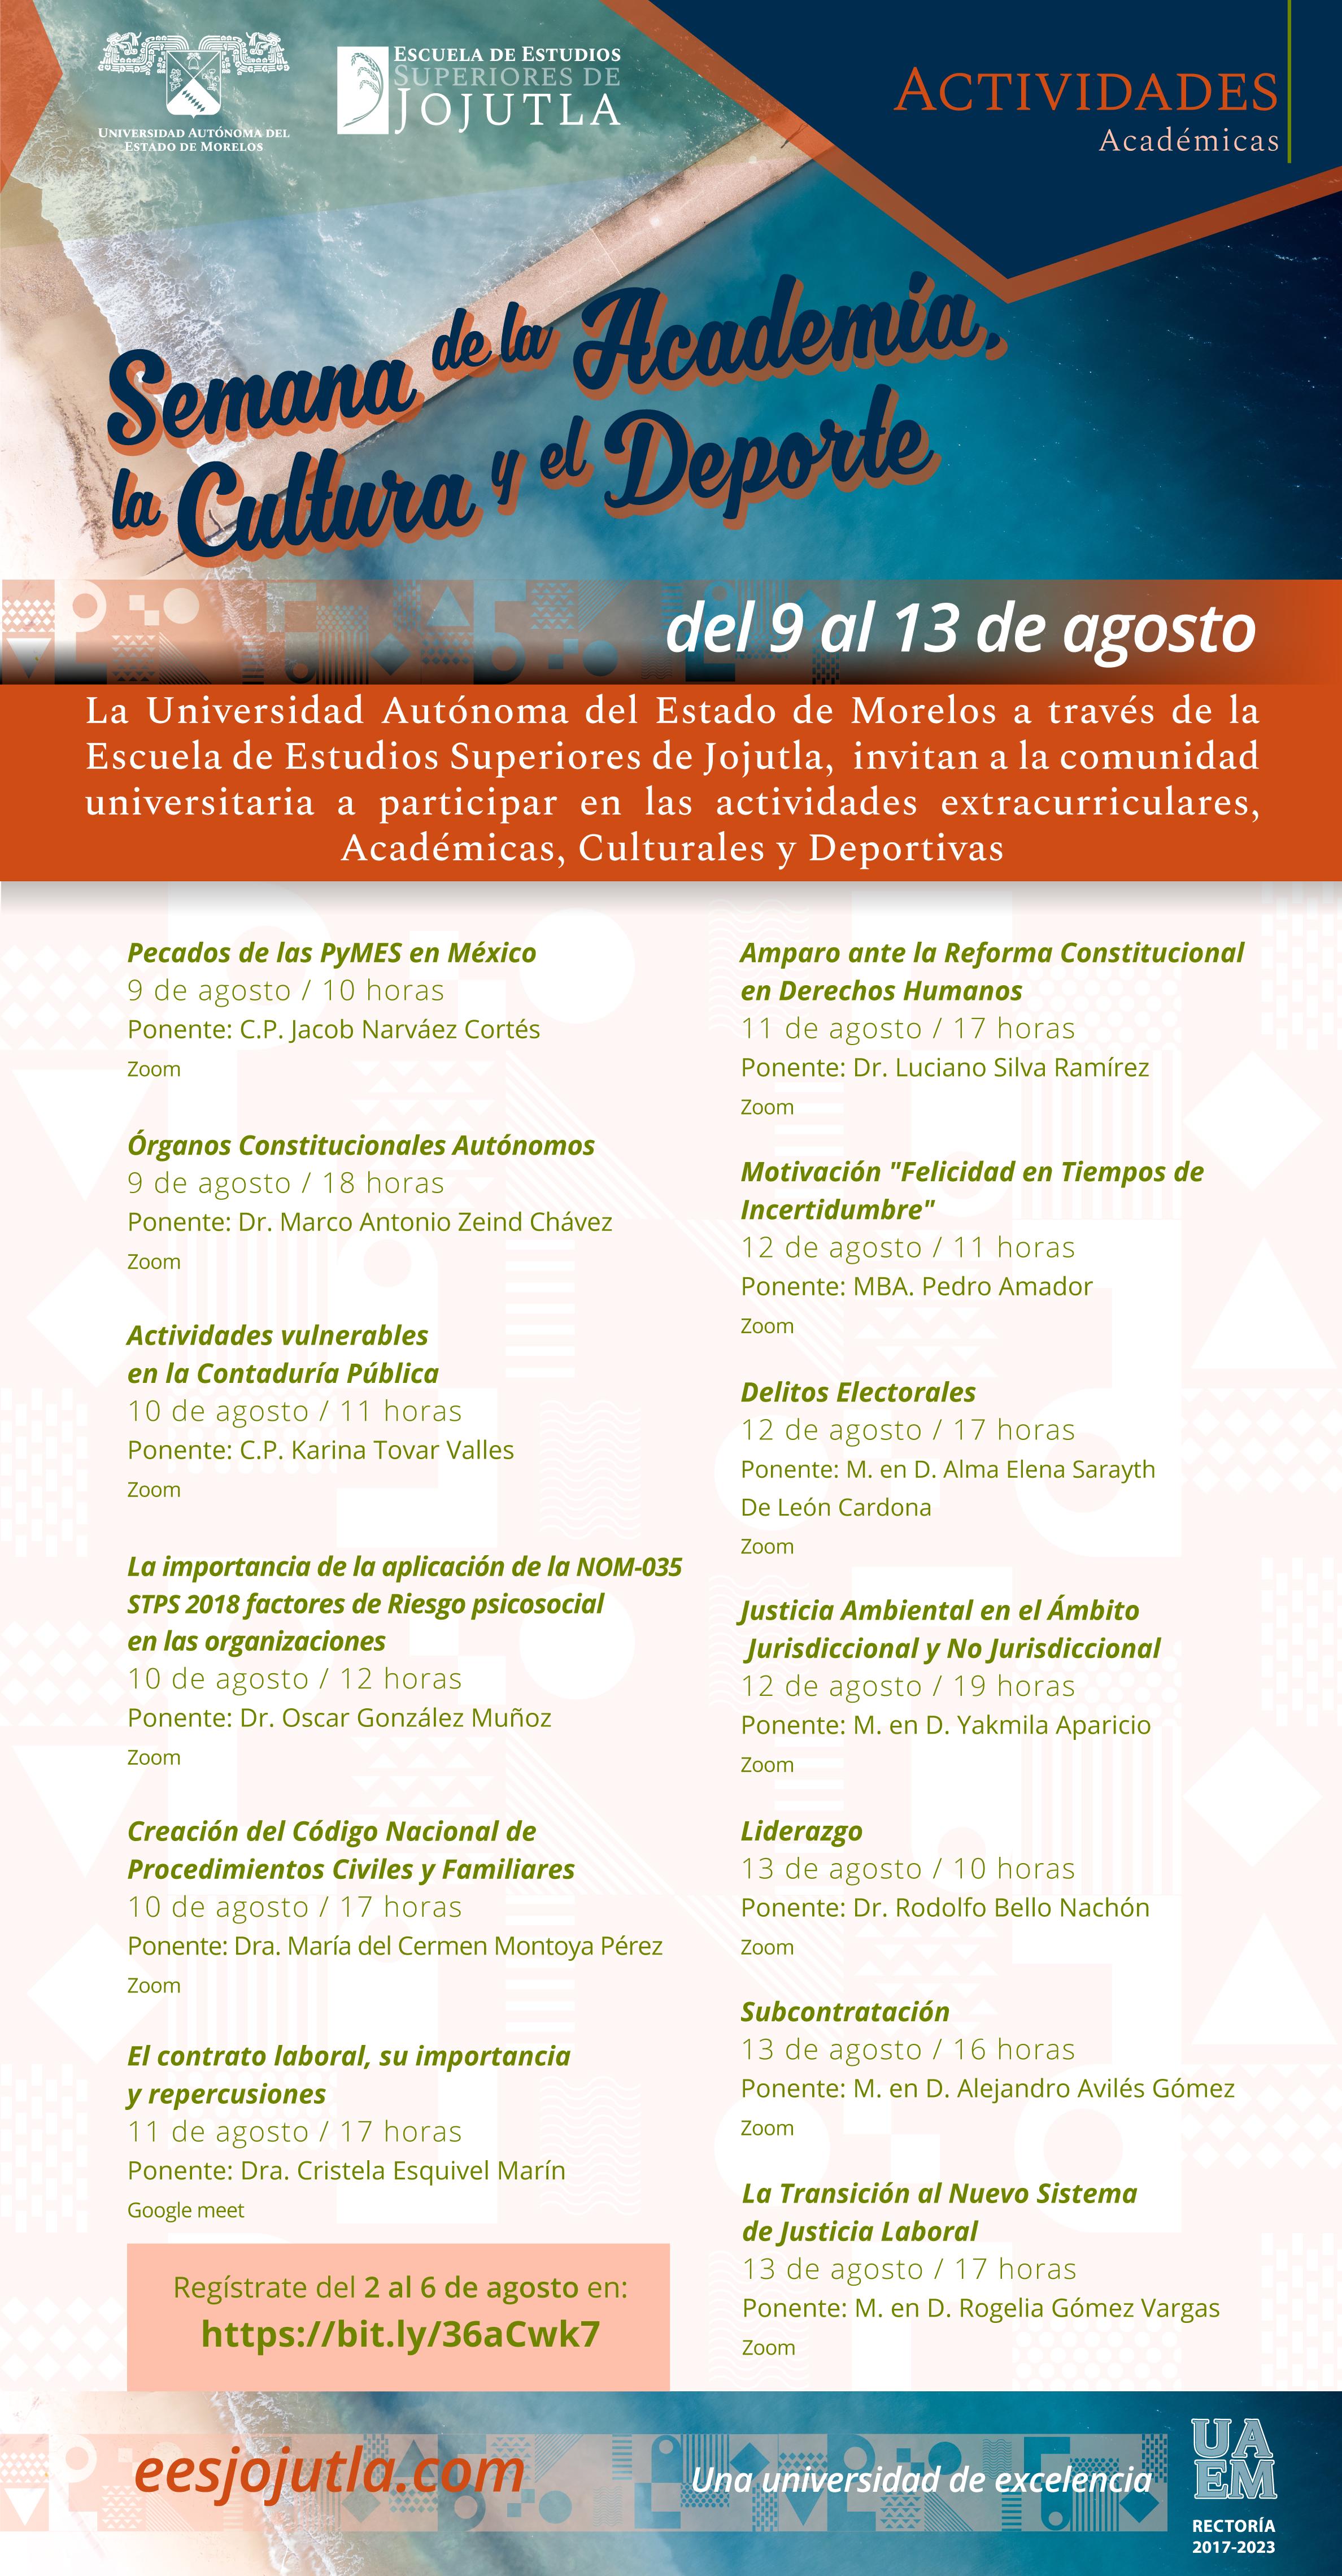 _Semana_ACyD_CARTEL_1_Academicas_07132021